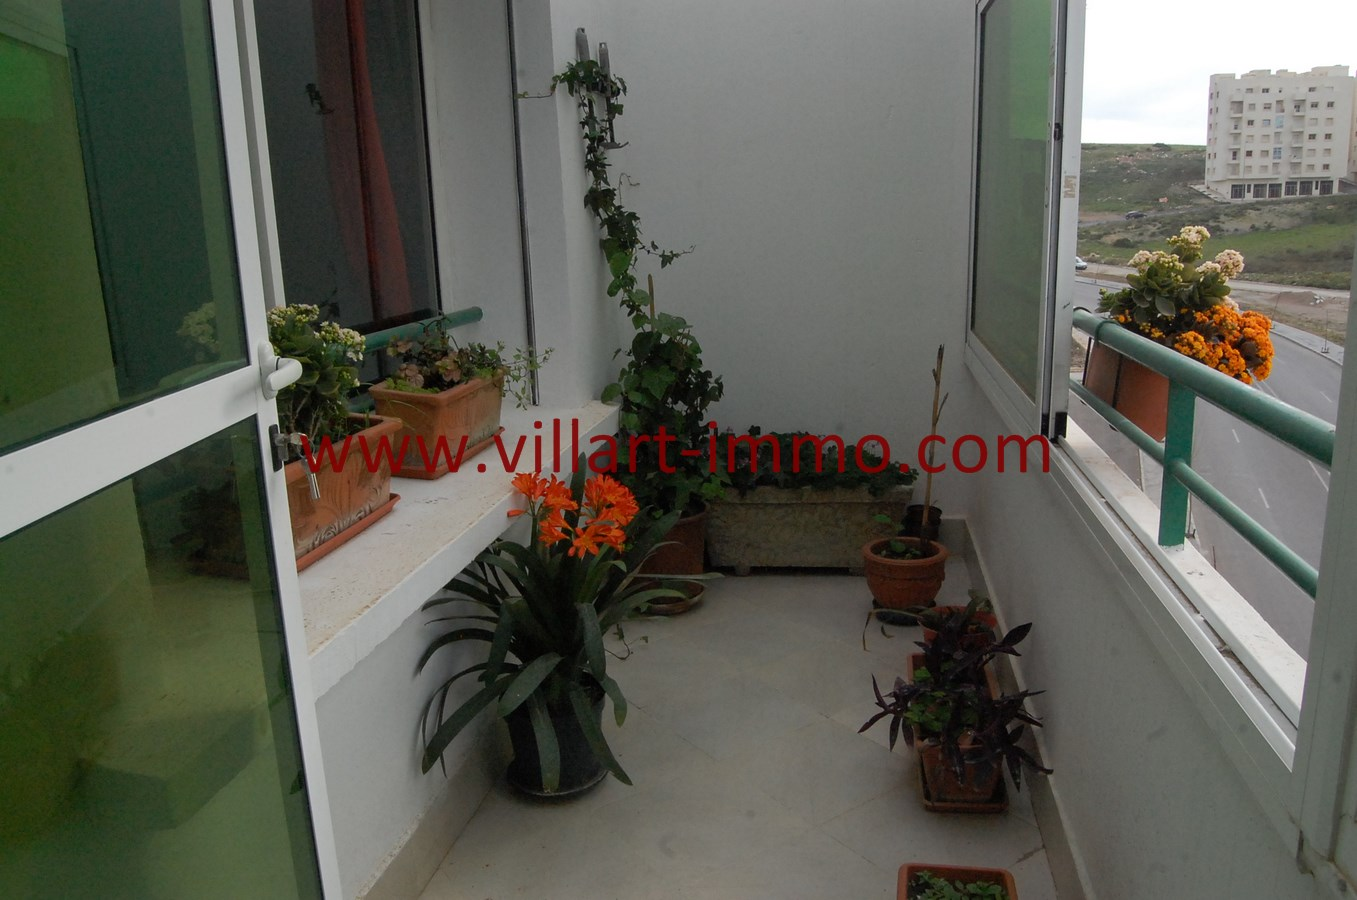 12-Vente-Appartement-Tanger-Terrasse 3-VA480-Villart Immo